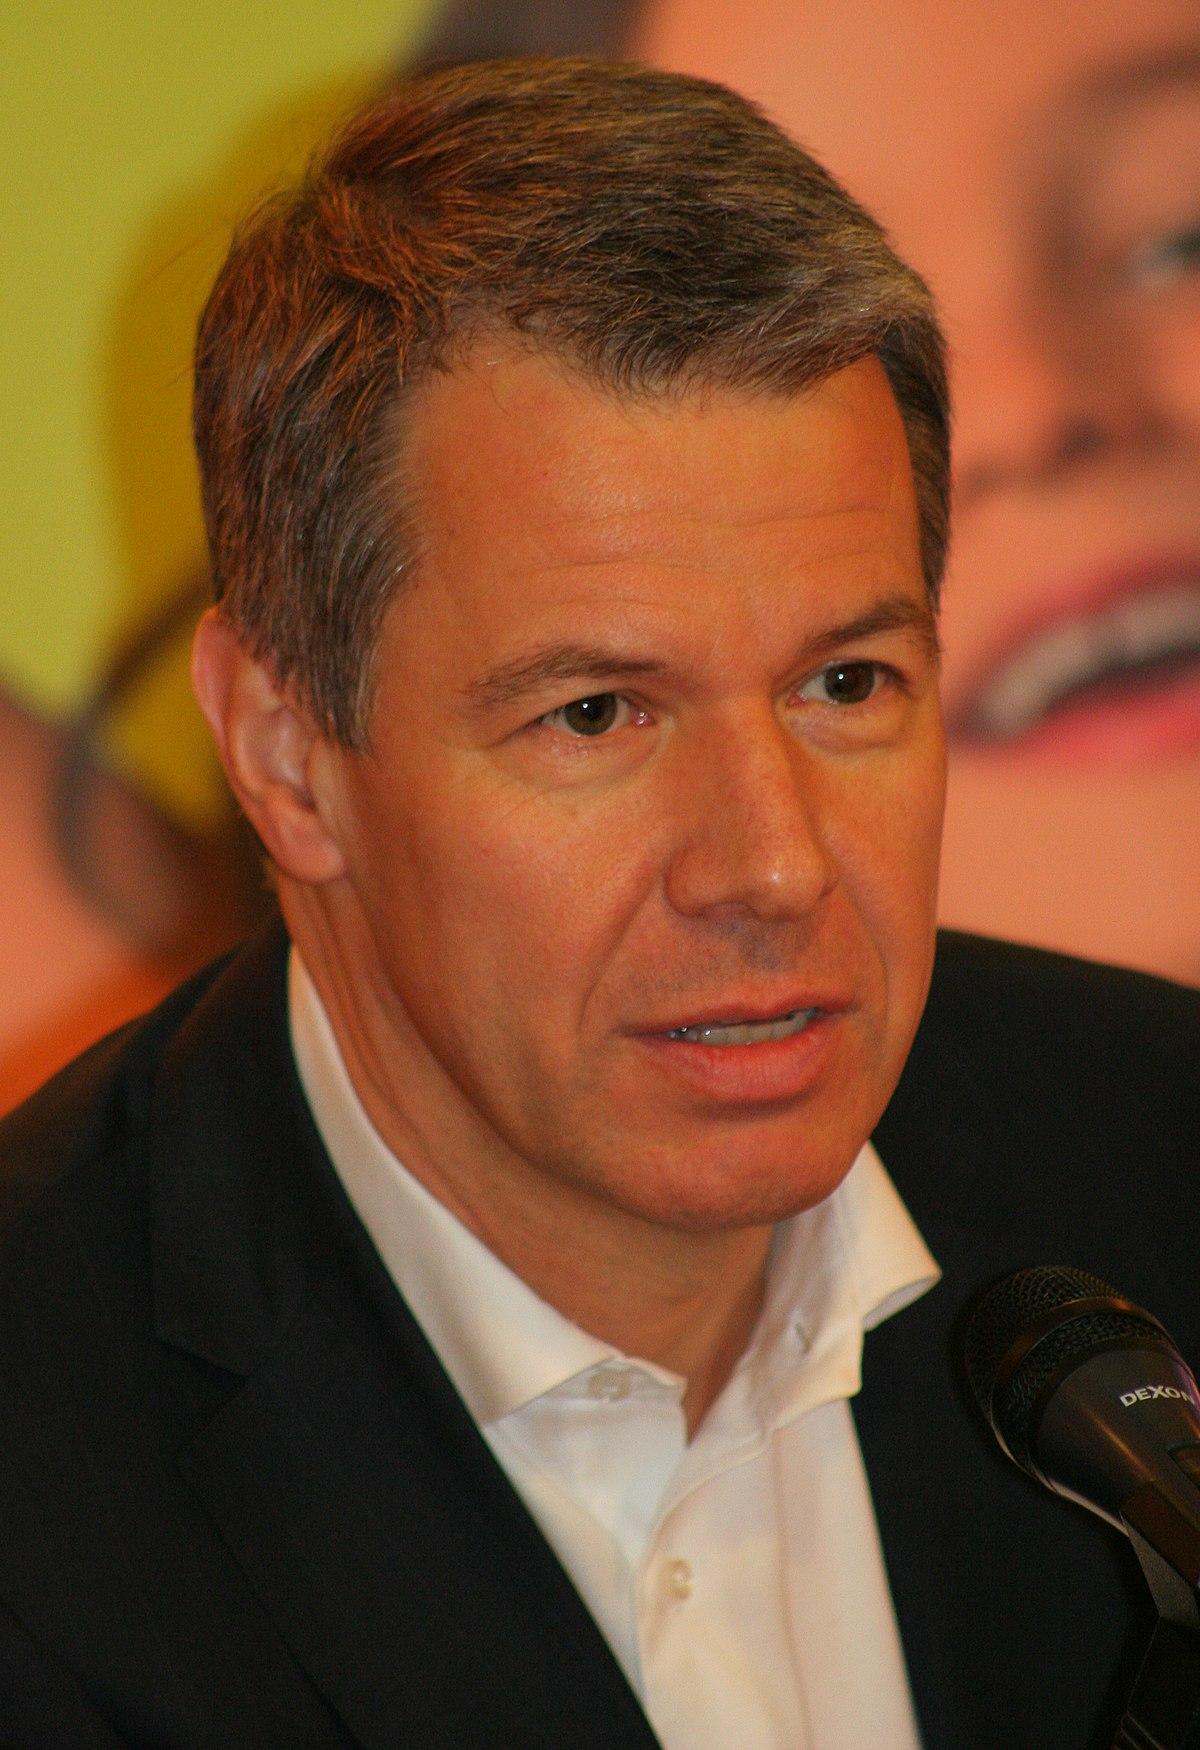 Peter Klöppel